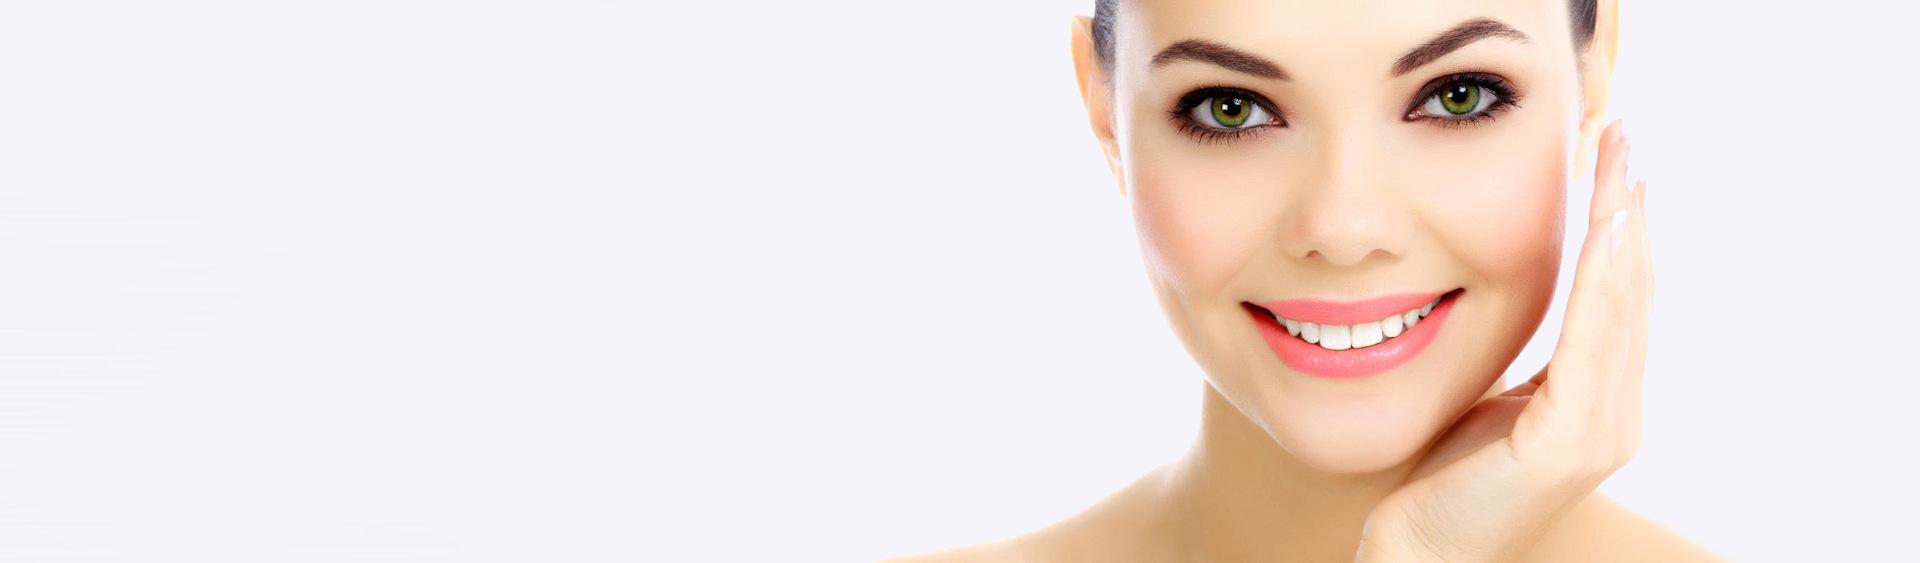 cosmesi-makeup-bellezza-parafarmacia